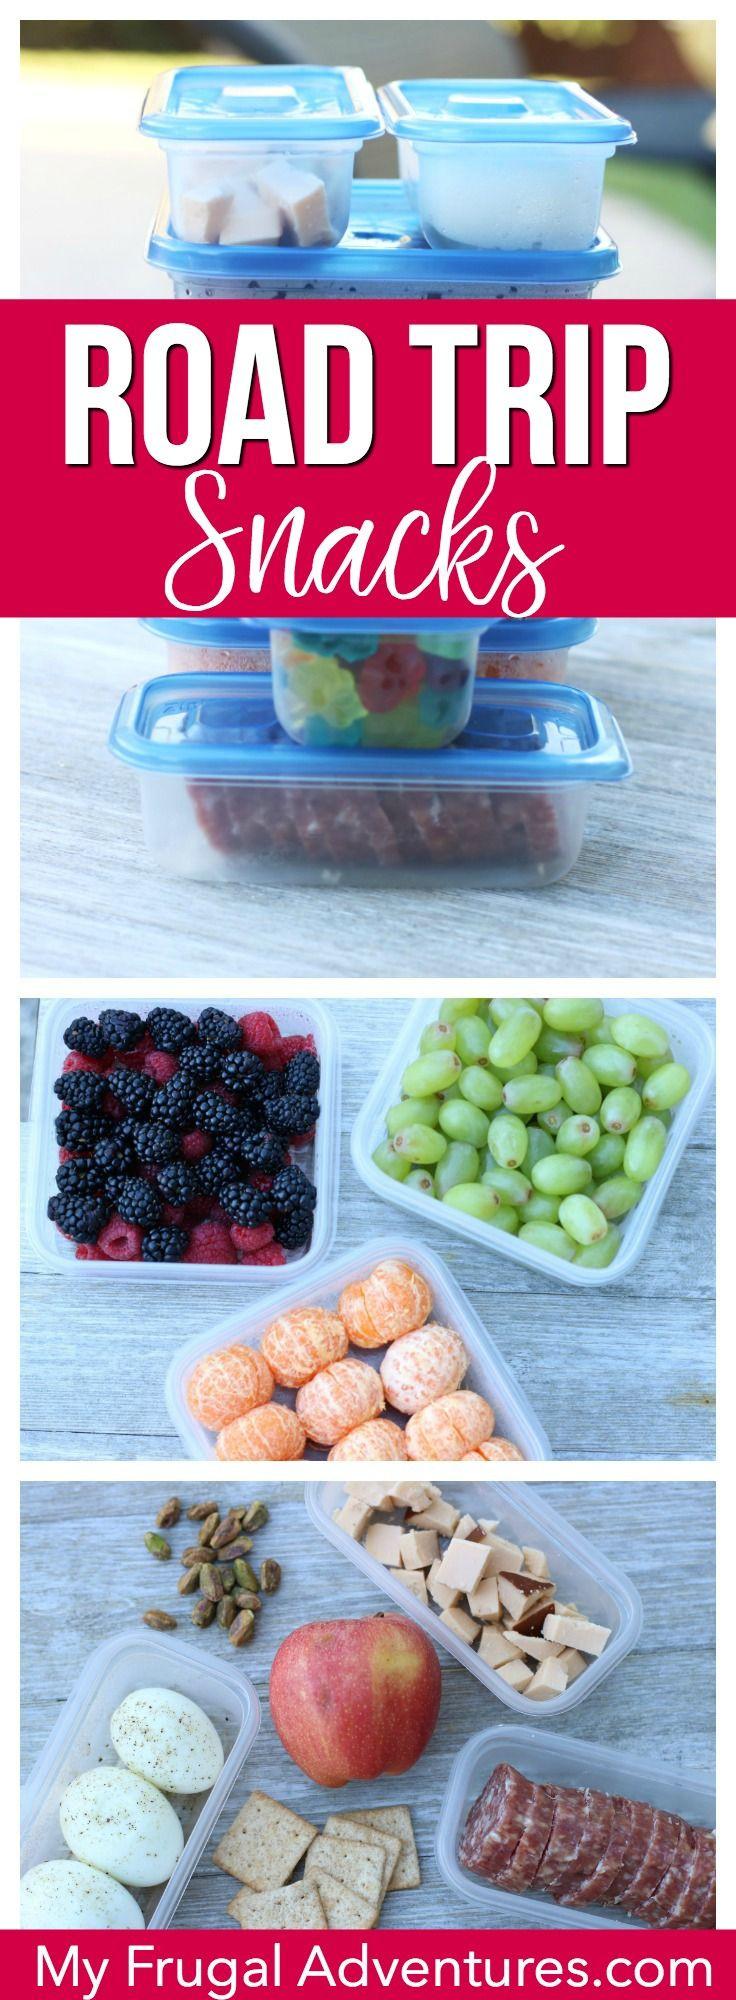 Healthy Road Trip Snacks  Simple healthy ish and fun road trip snack ideas Pack